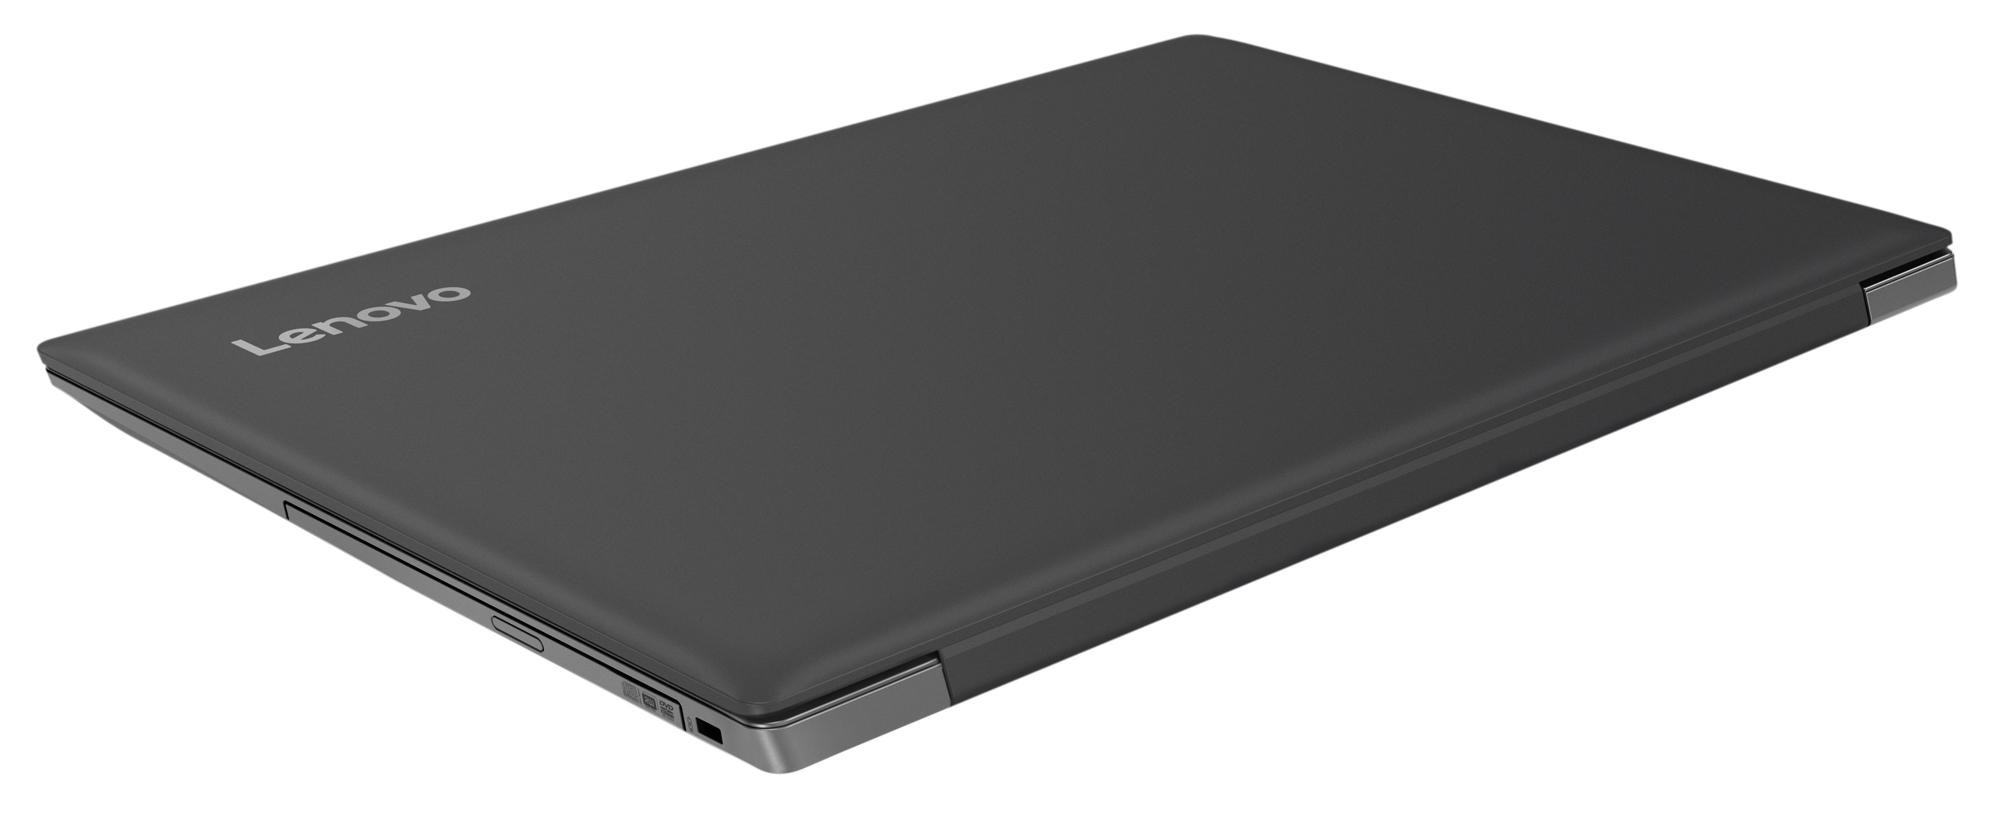 Фото  Ноутбук Lenovo ideapad 330-15 Onyx Black (81DC005TRA)